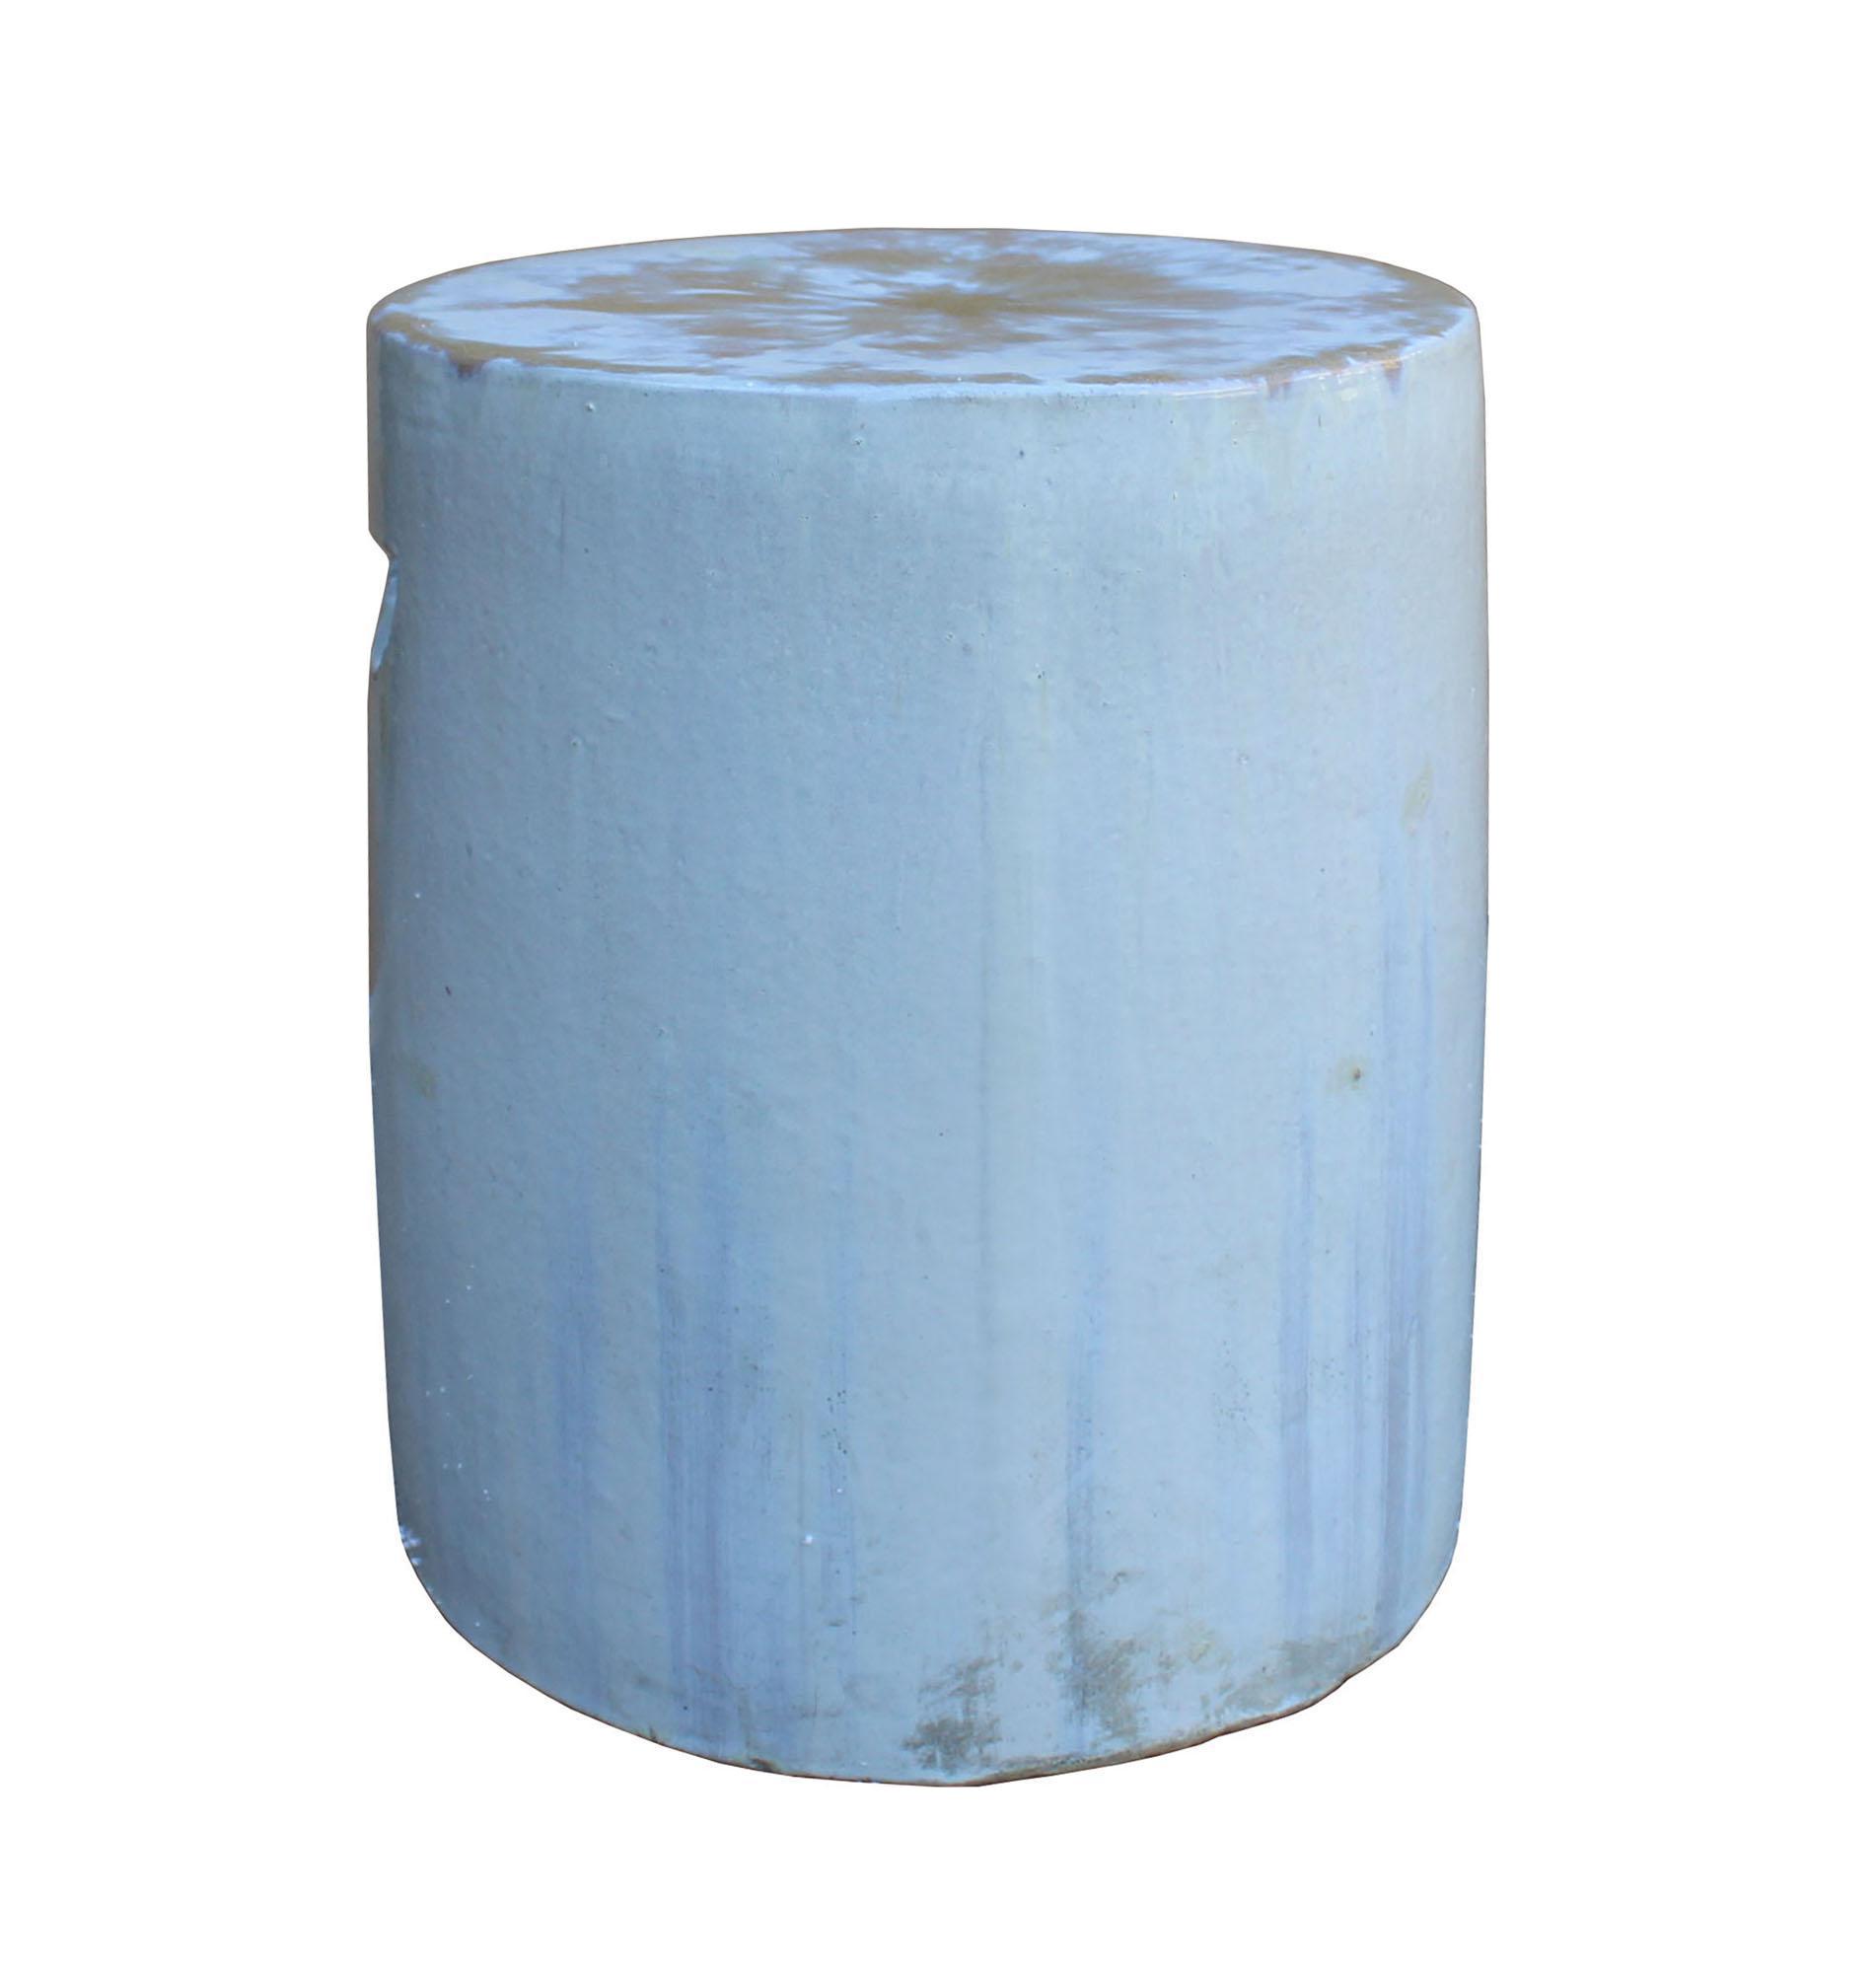 chinese ceramic clay off white glaze round flat column garden stool